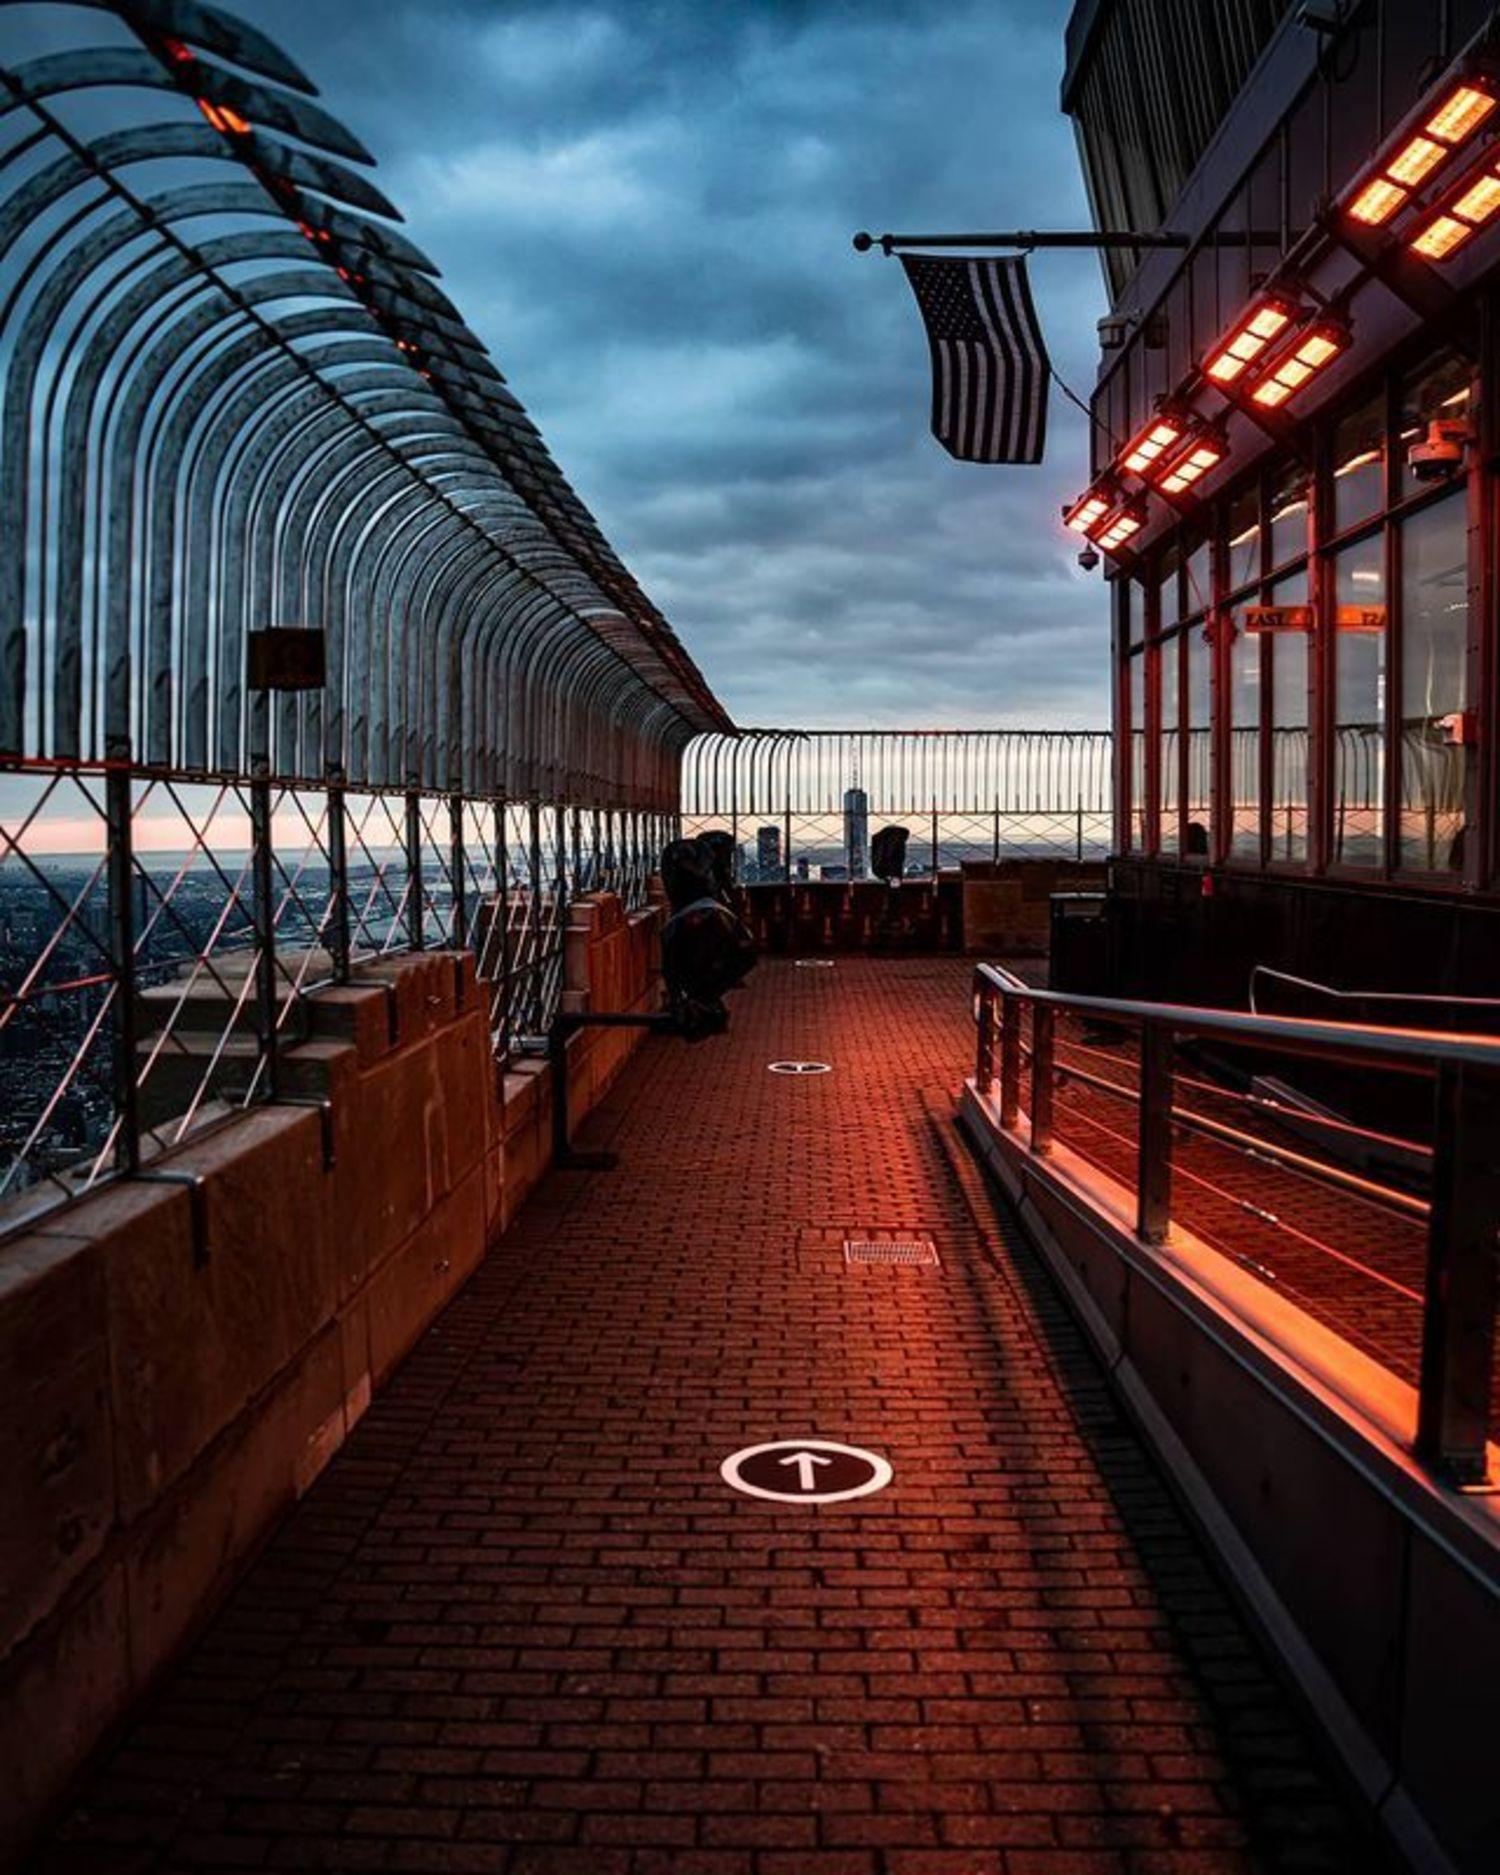 Empire State Building 86th Floor Observation Deck, Midtown, Manhattan